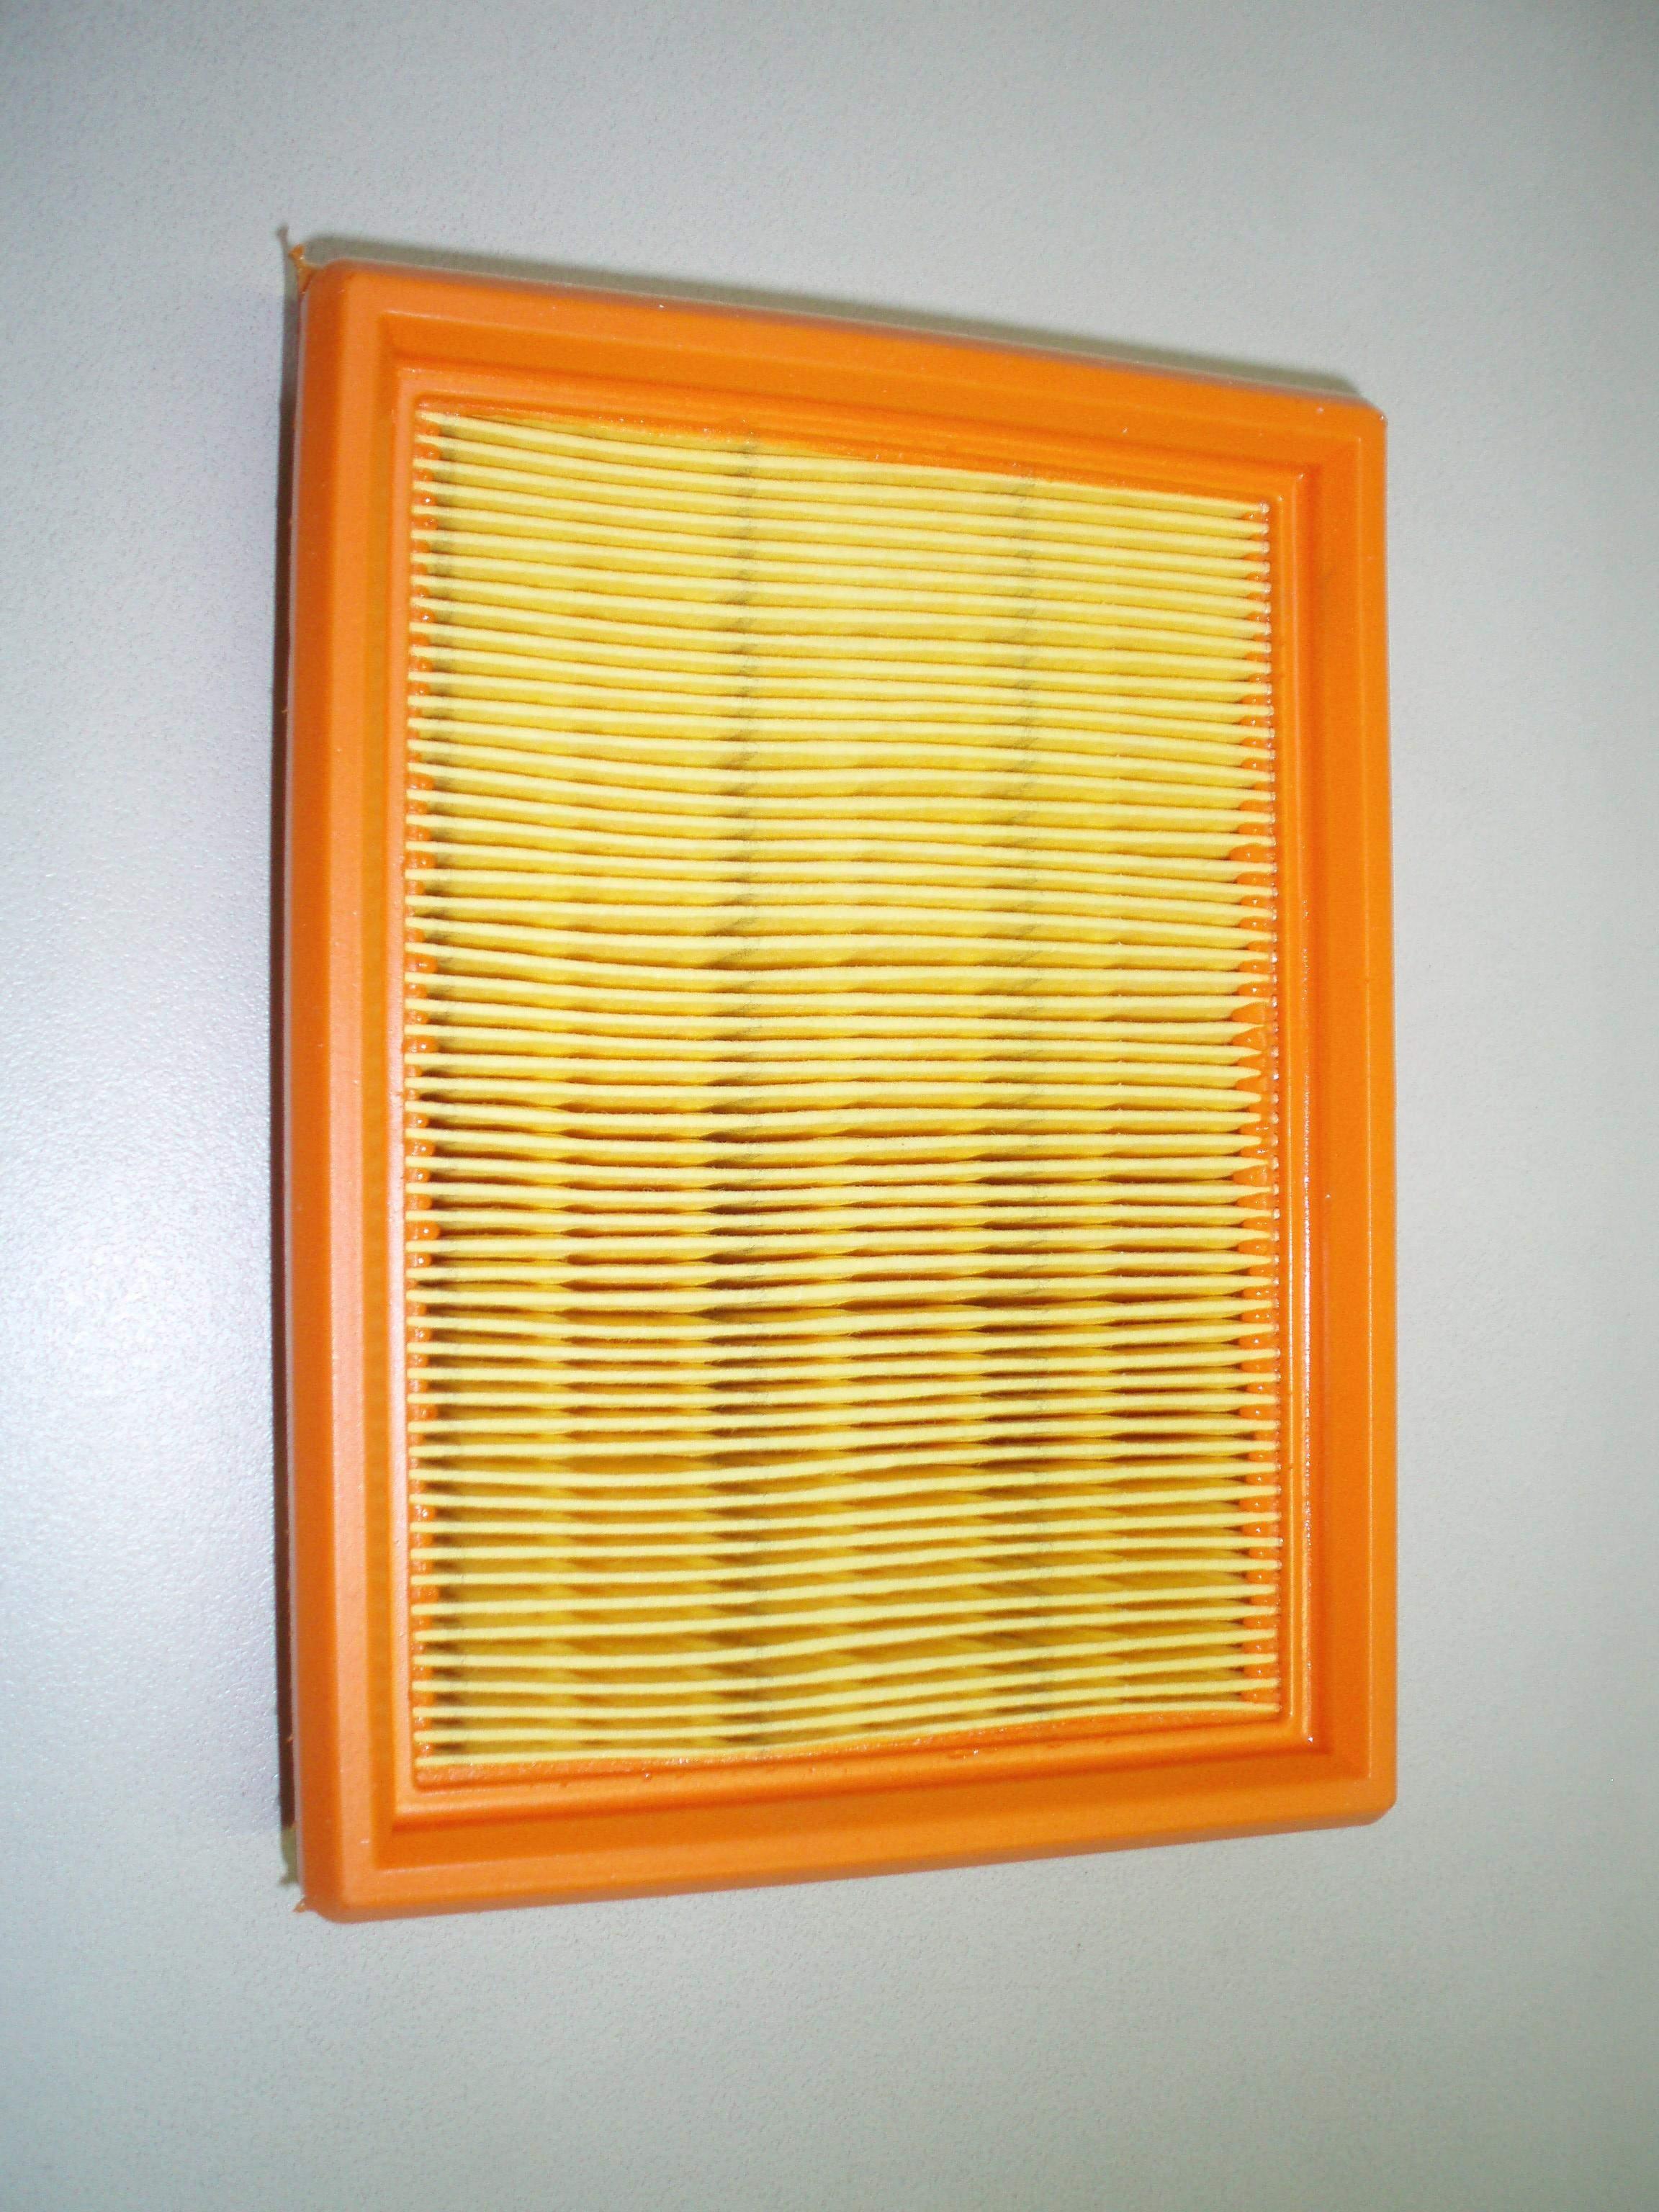 Cartouche filtre à air d'origine, de marque LOMBARDINI